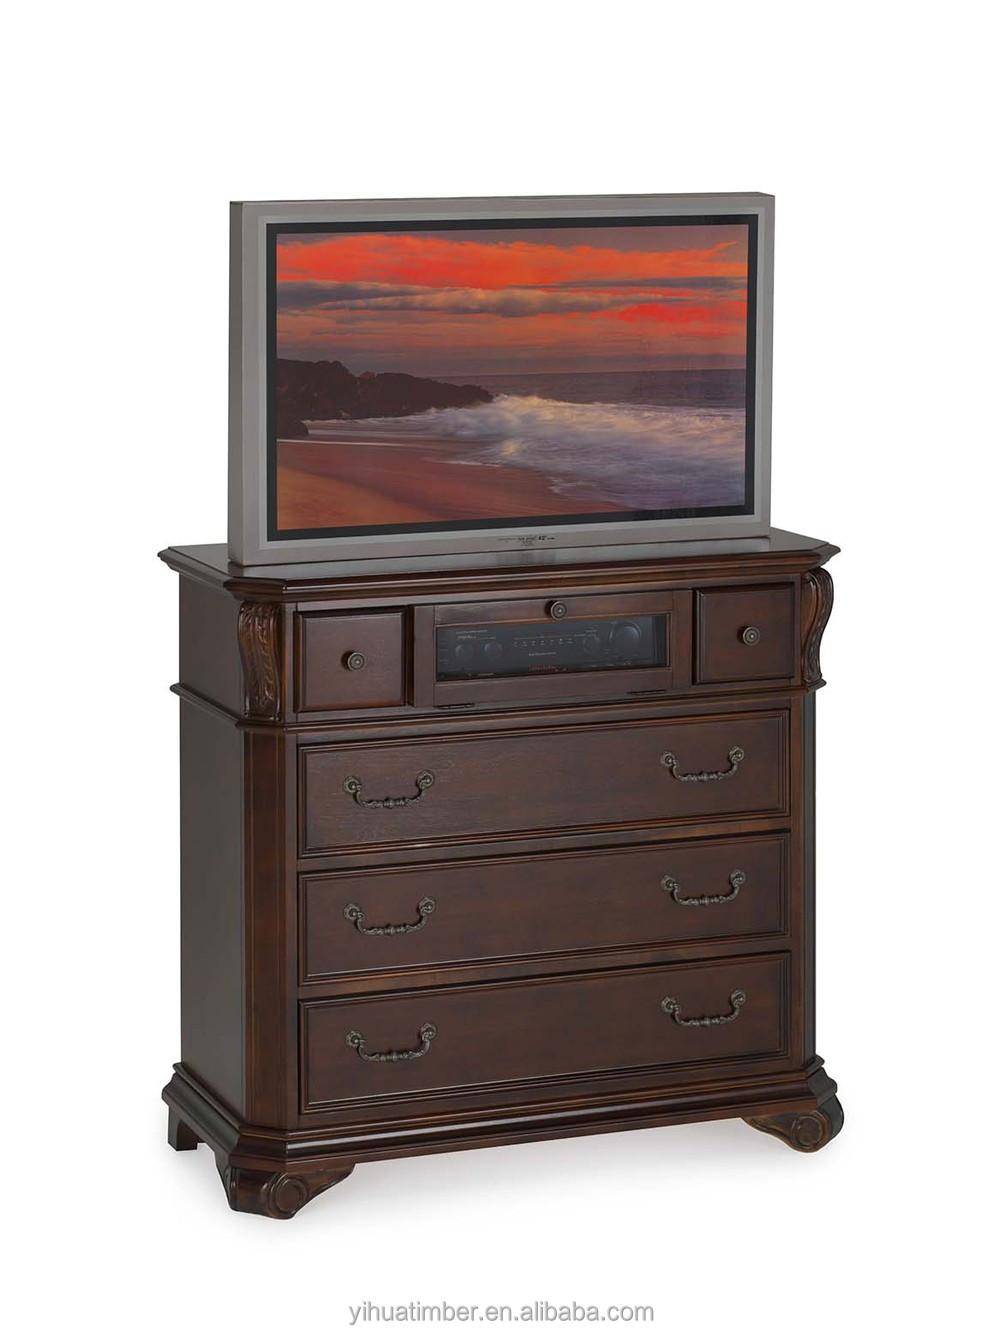 Moderne slaapkamer meubilair 2015 nieuwe ontwerpen, warm te koop ...